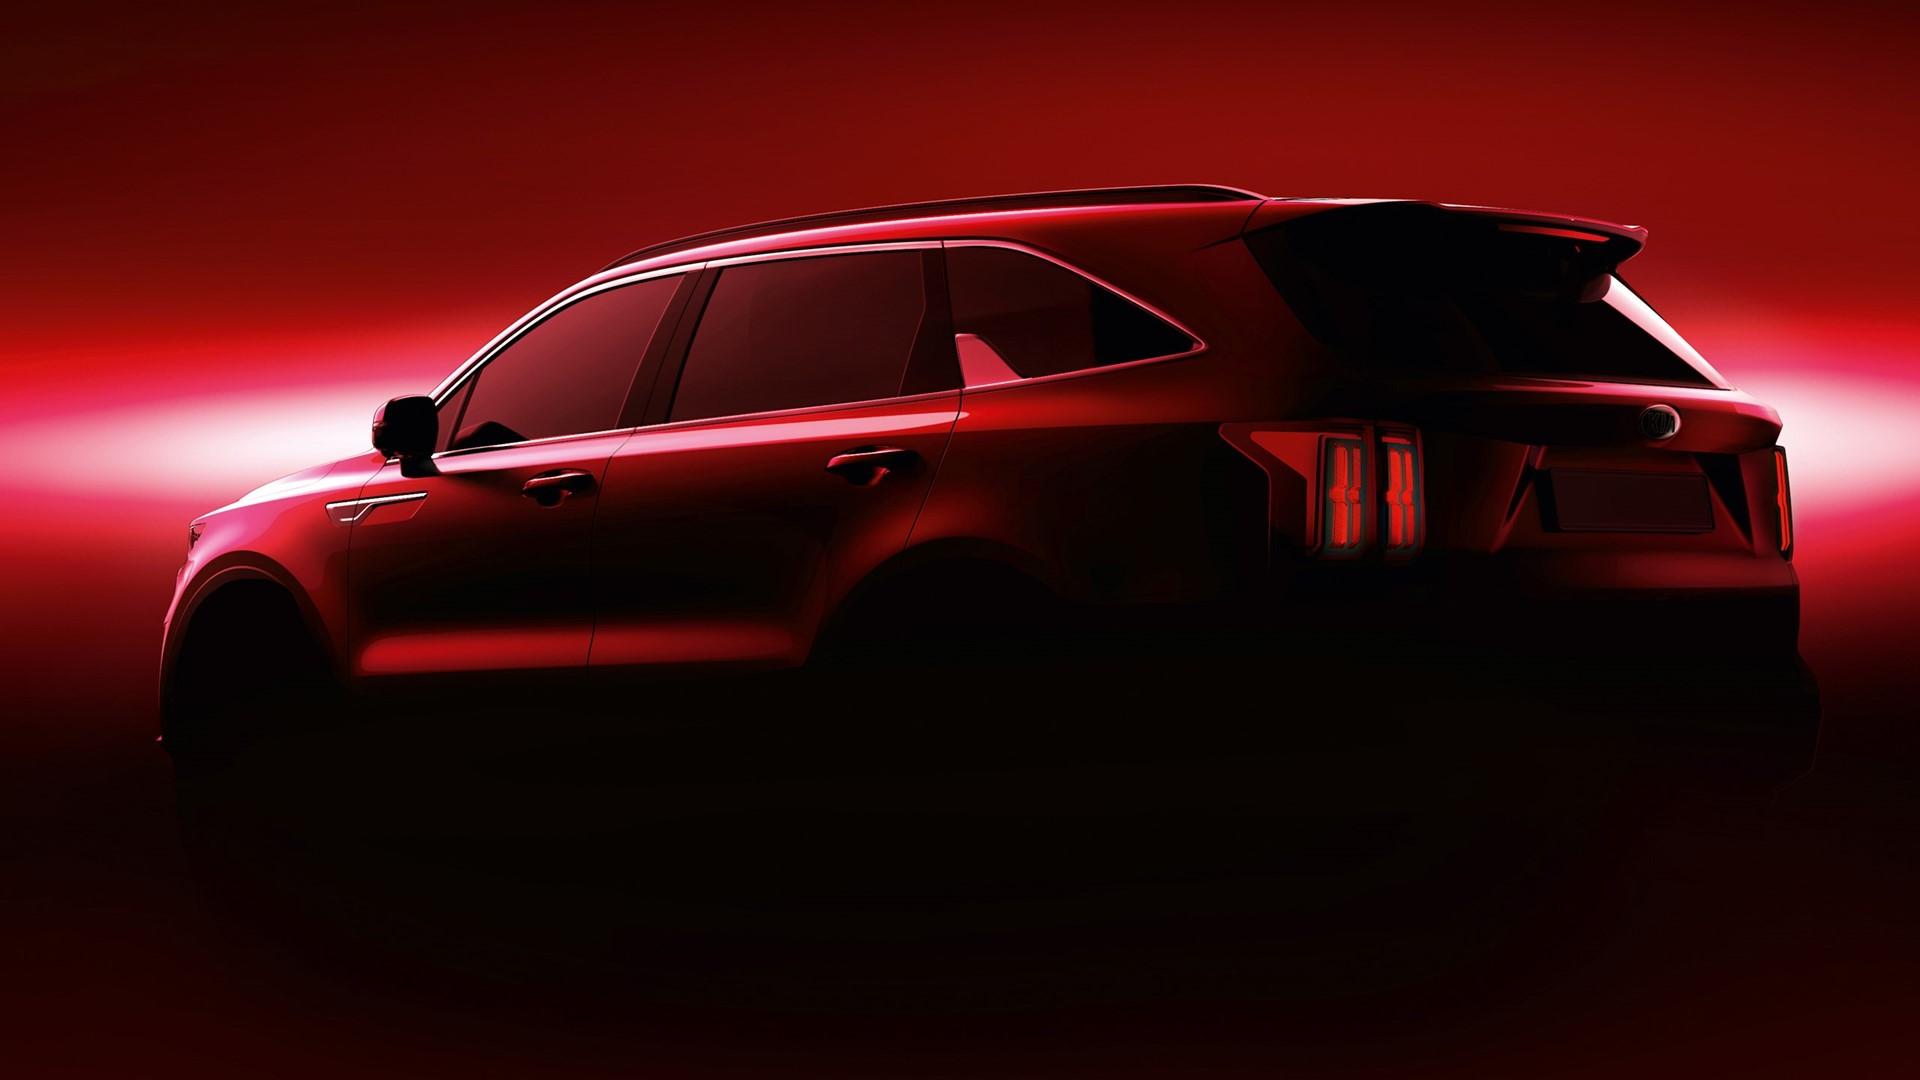 Powerful, progressive and versatile: the new Kia Sorento - Image 6